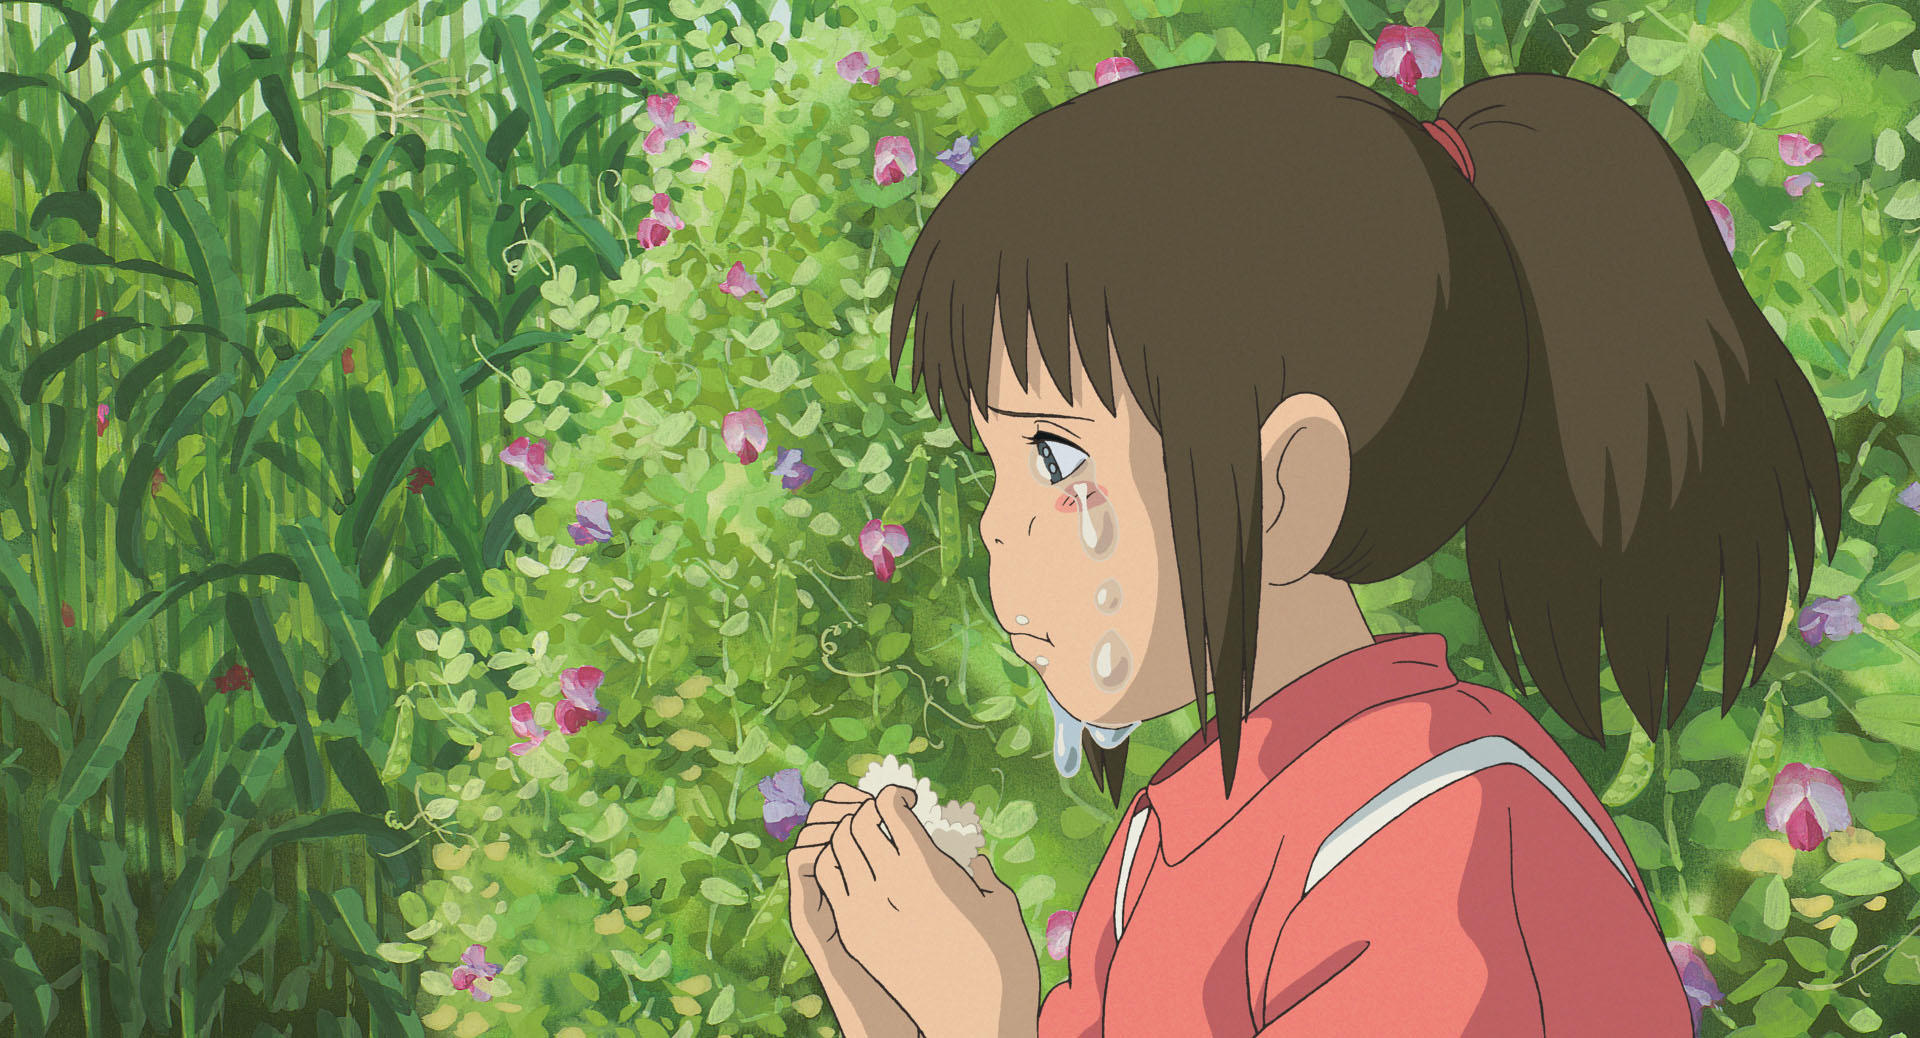 Miyazaki Photo,Miyazaki Twitter Trend : Most Popular Tweets